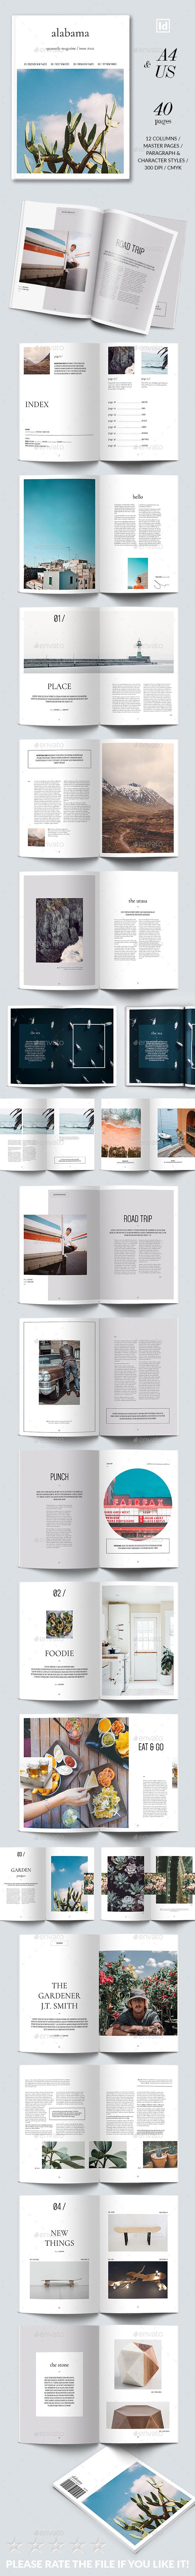 Alabama Magazine Template - Magazines Print Templates